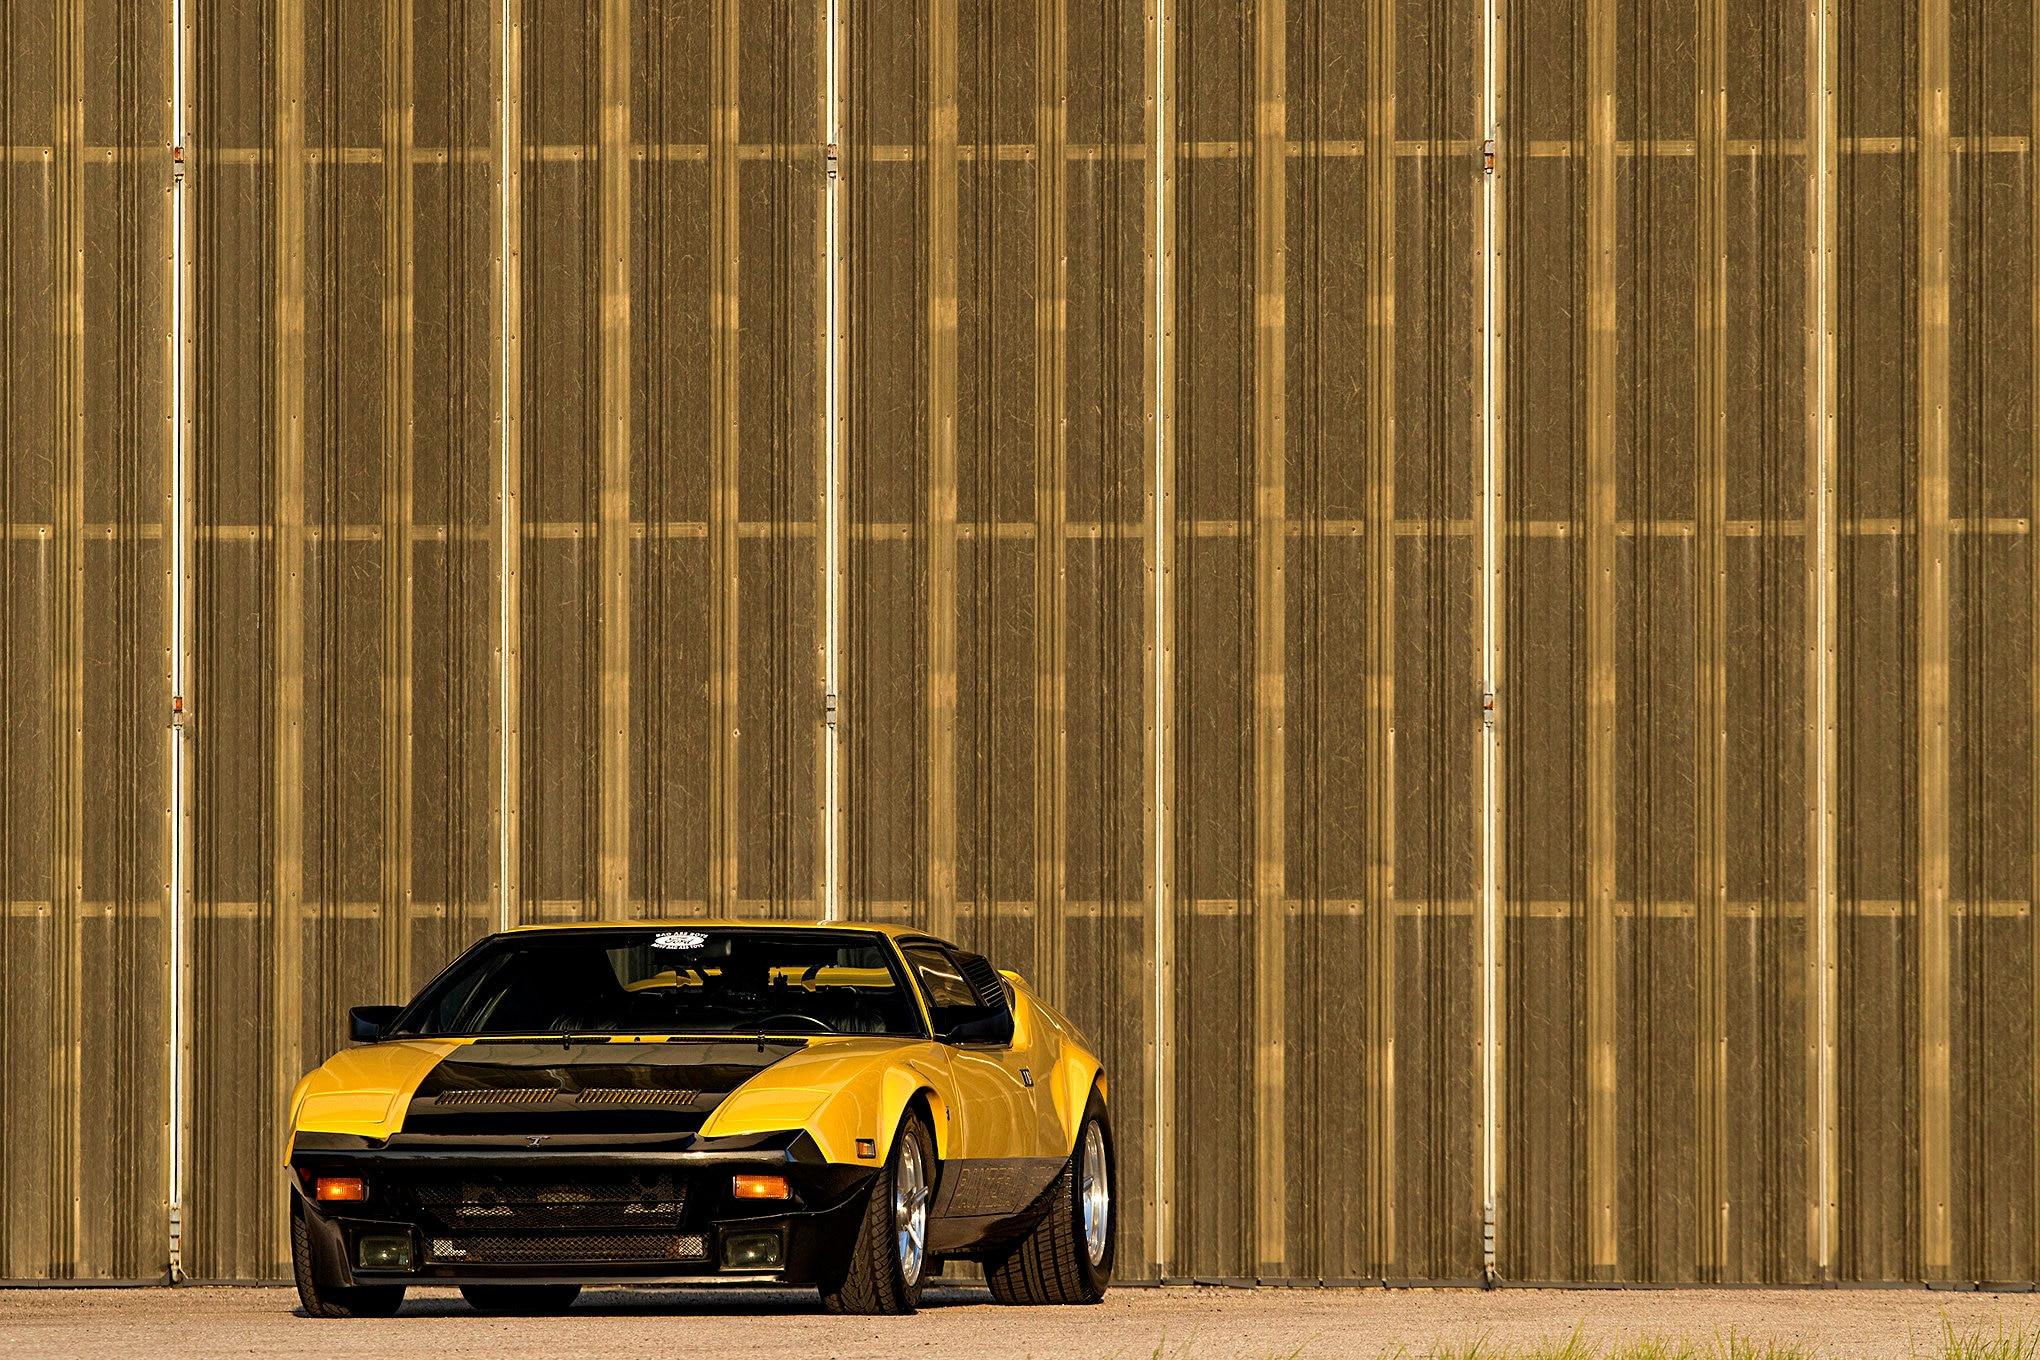 028 1974 Pantera GTS Twin Turbo